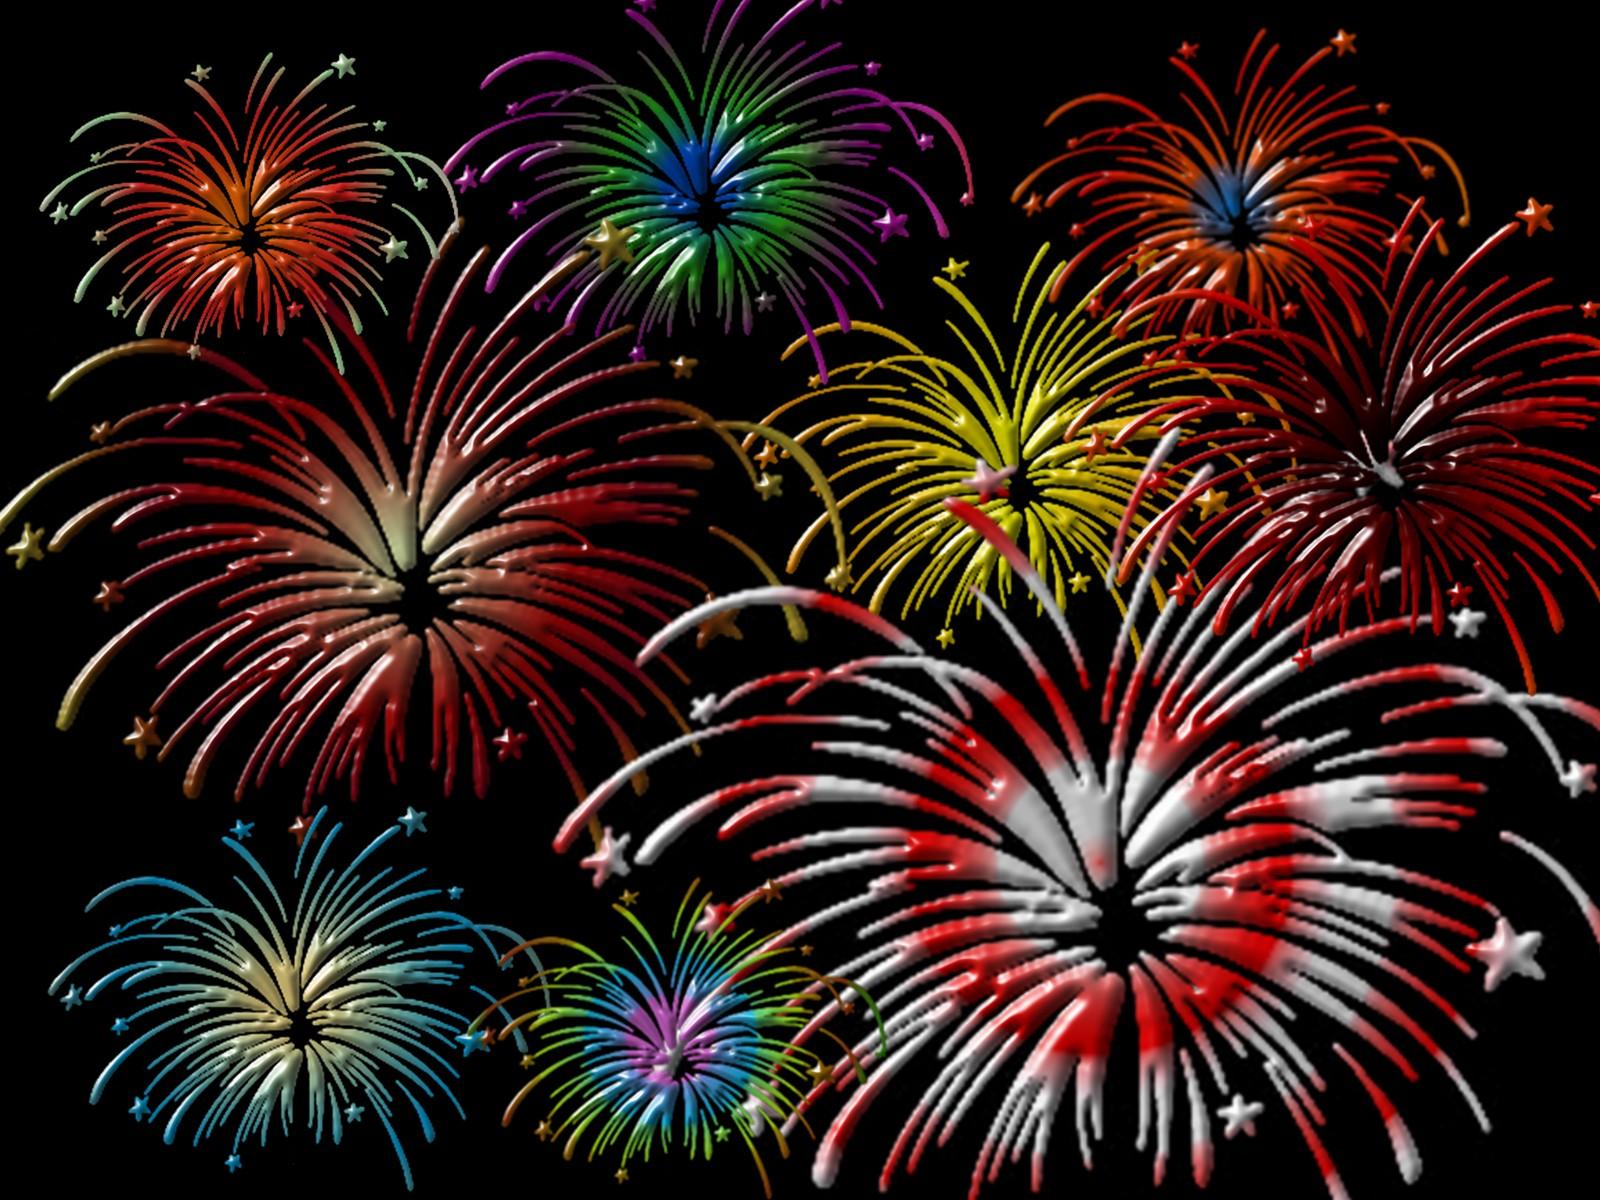 Fireworks Wallpaper Free: Latest Fireworks Wallpapers